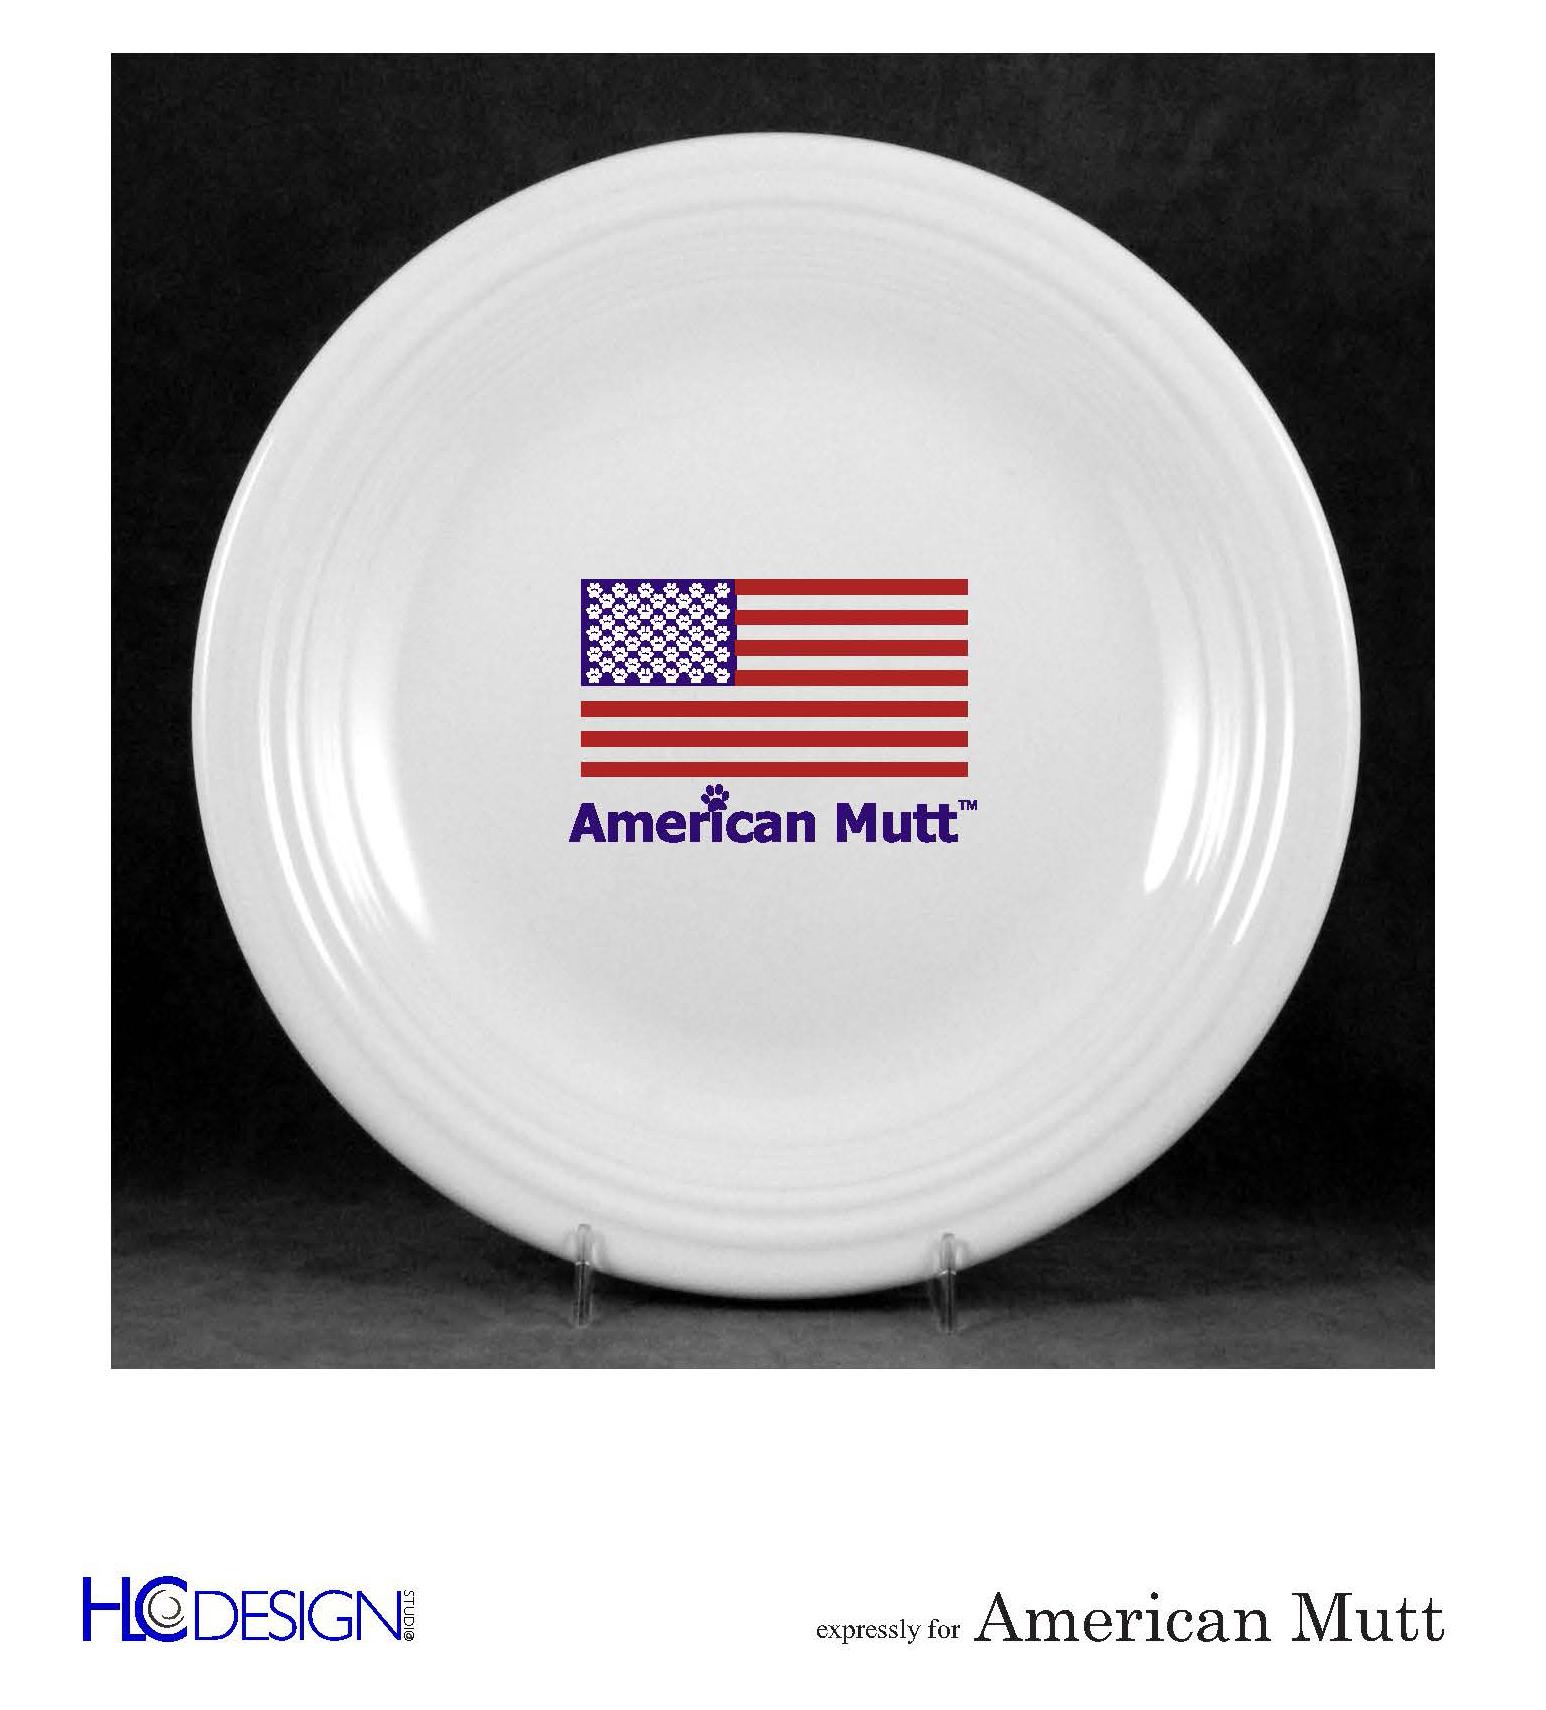 american mutt plate